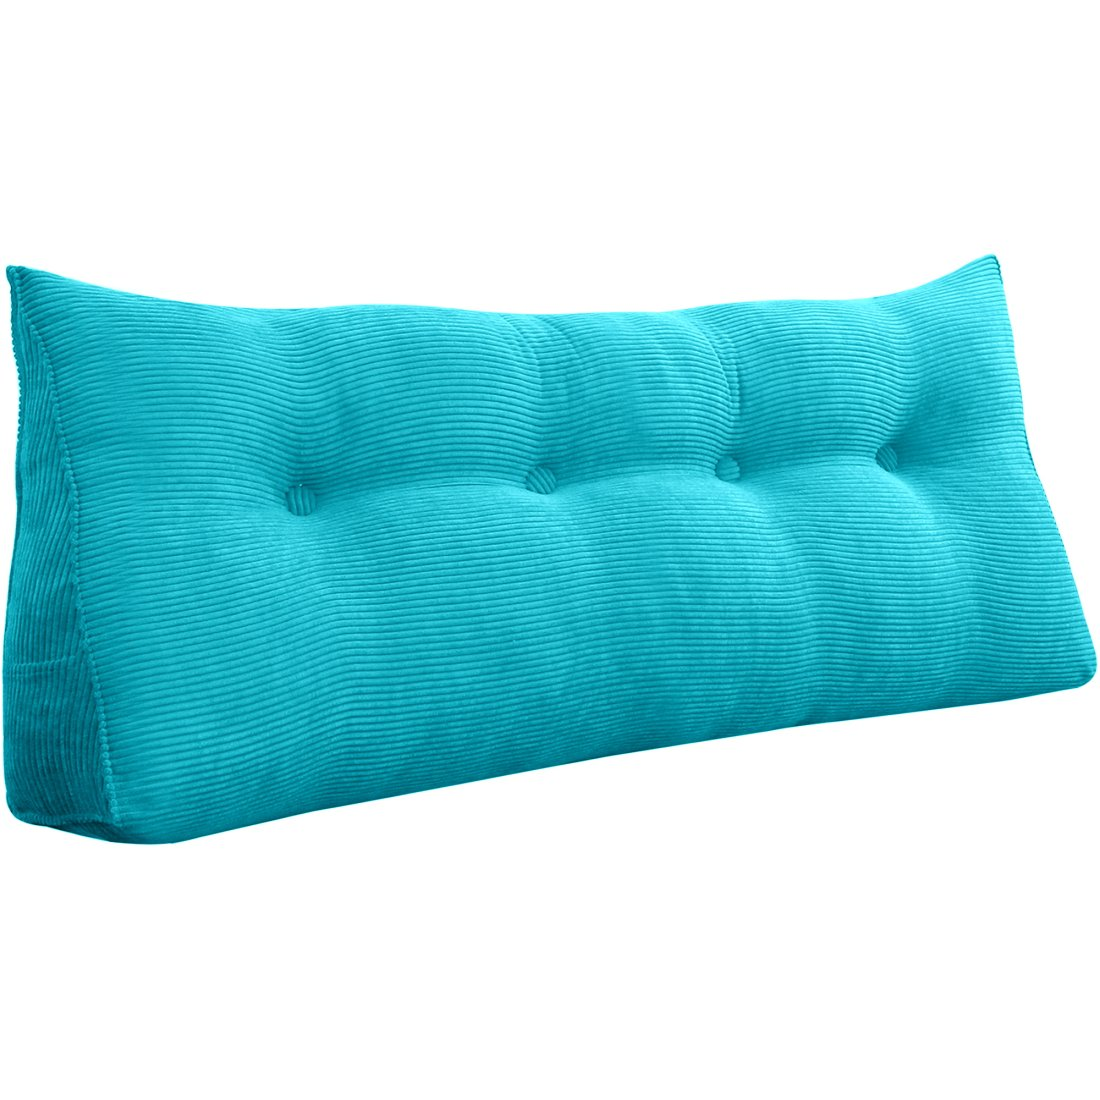 triangular reading pillow large bolster